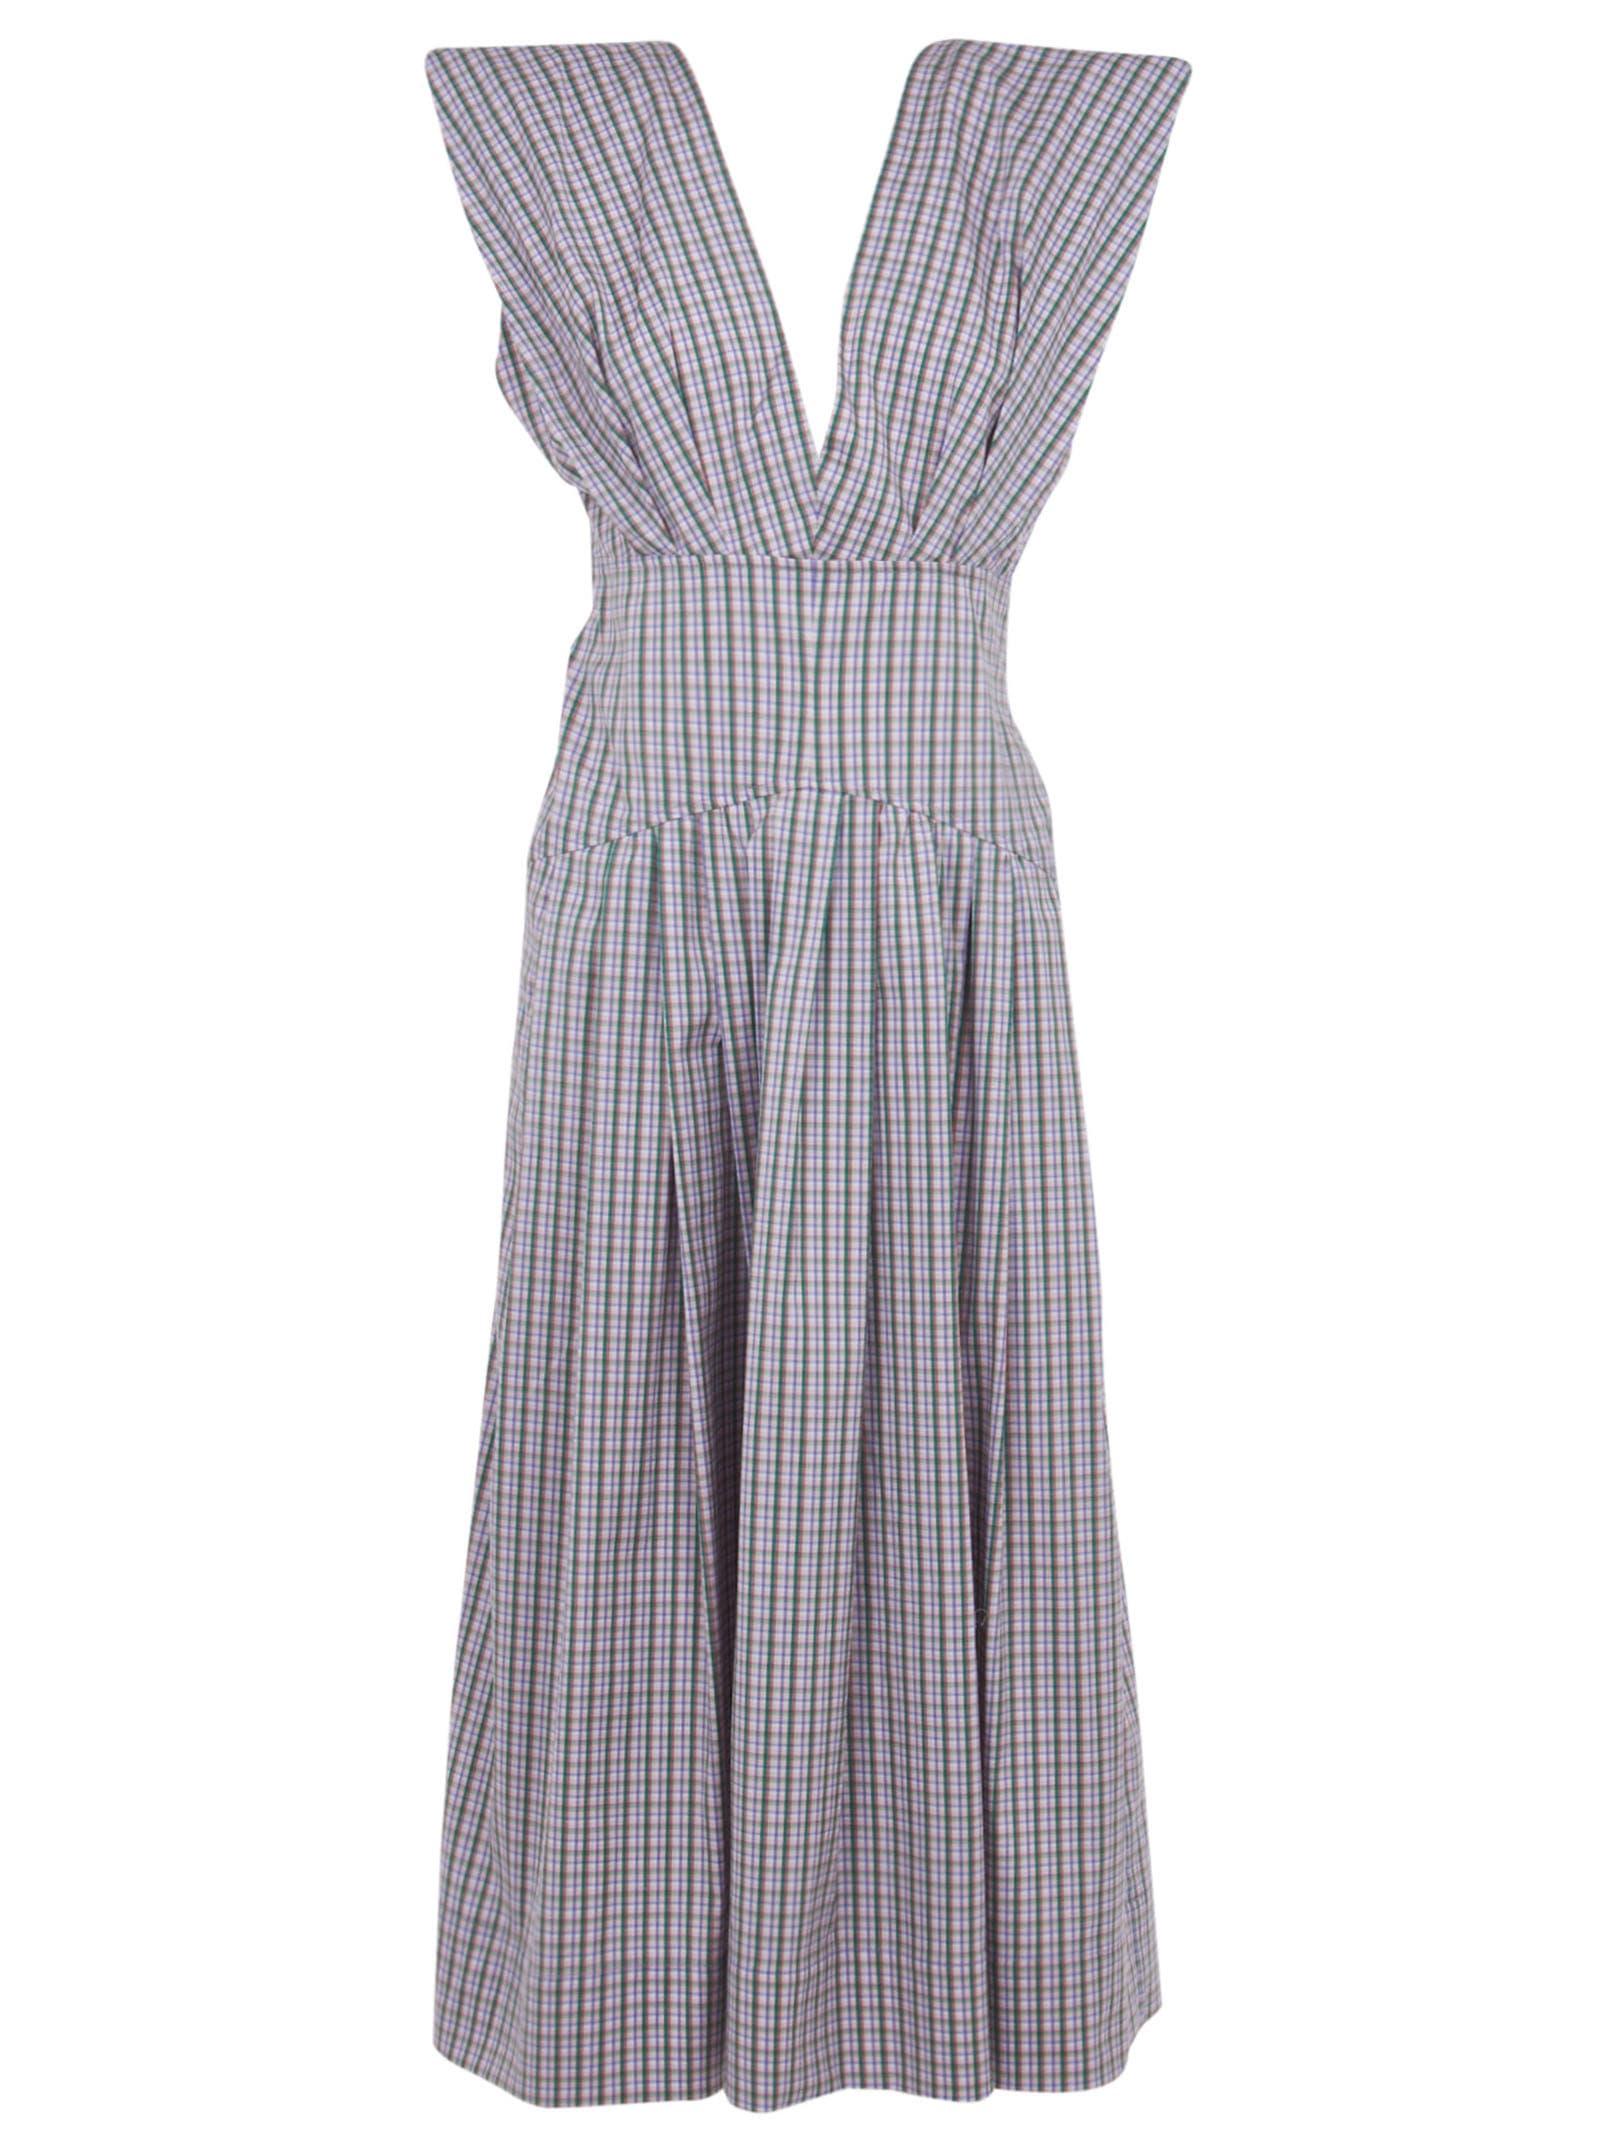 Buy Philosophy di Lorenzo Serafini V-neck Sleeveless Long Dress online, shop Philosophy di Lorenzo Serafini with free shipping